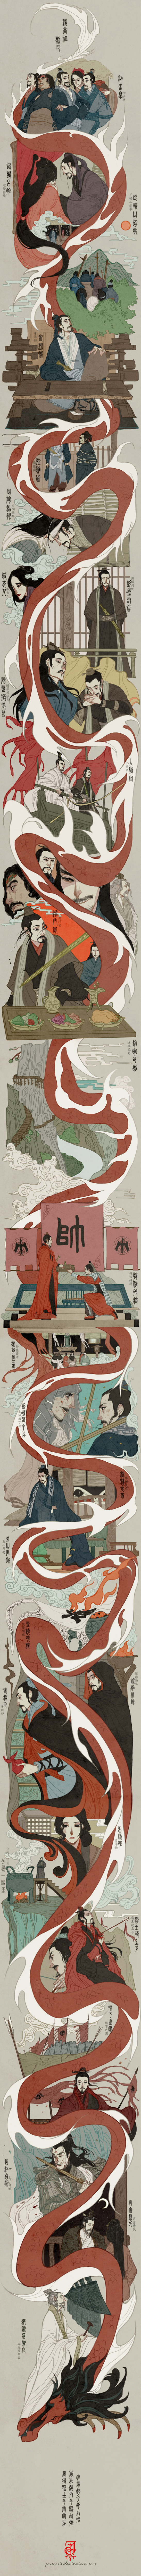 [Legend of Chu and Han]Liu Bang by Wavesheep